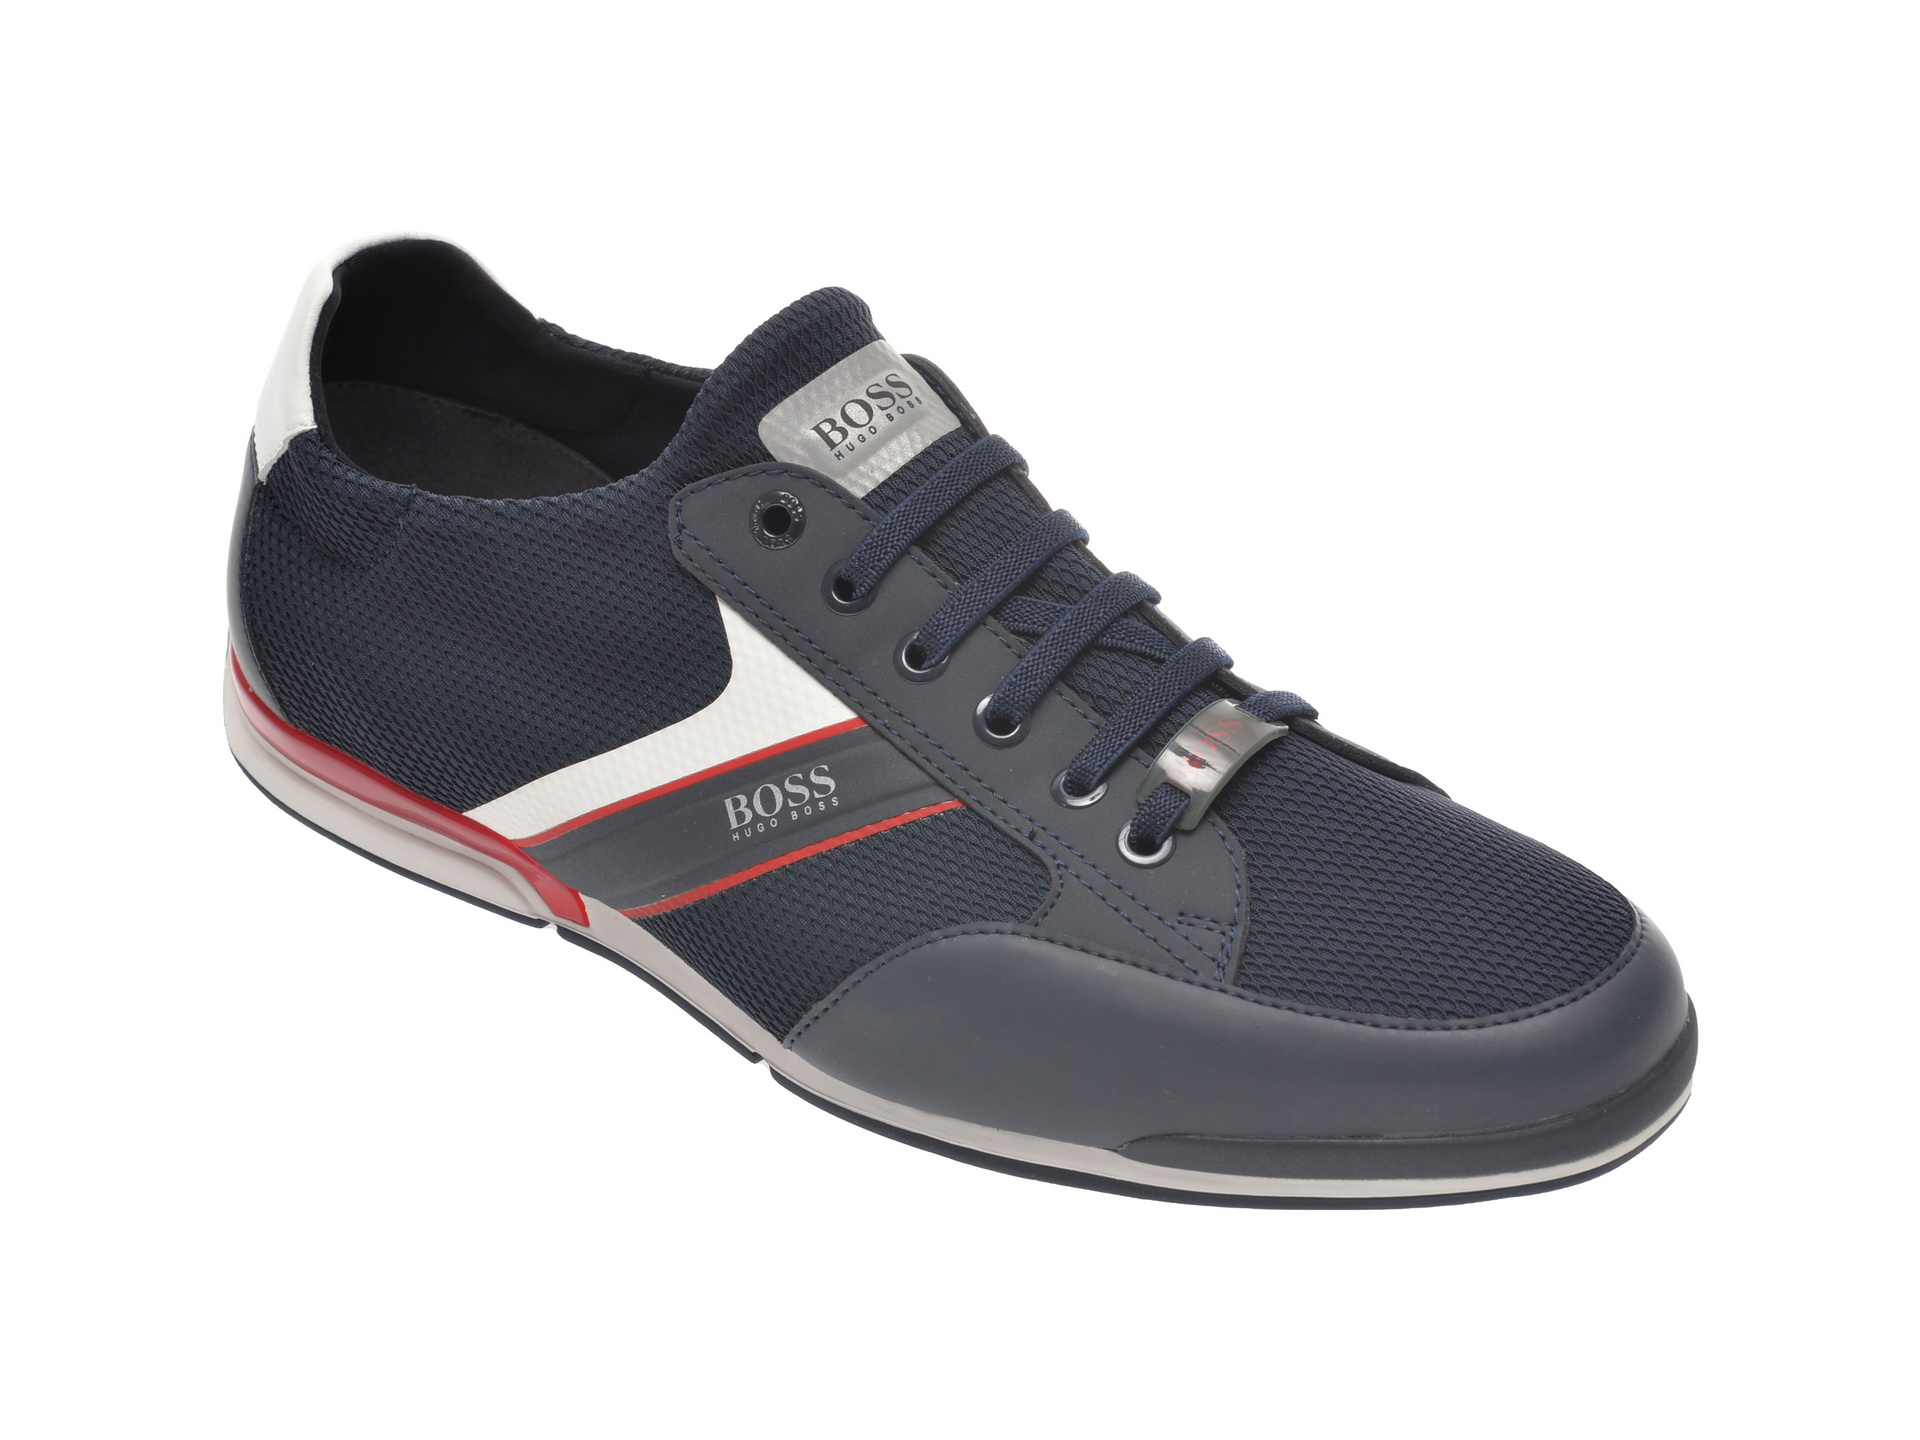 Pantofi Sport Hugo Boss Bleumarin, 8244, Din Material Textil Si Piele Ecologica